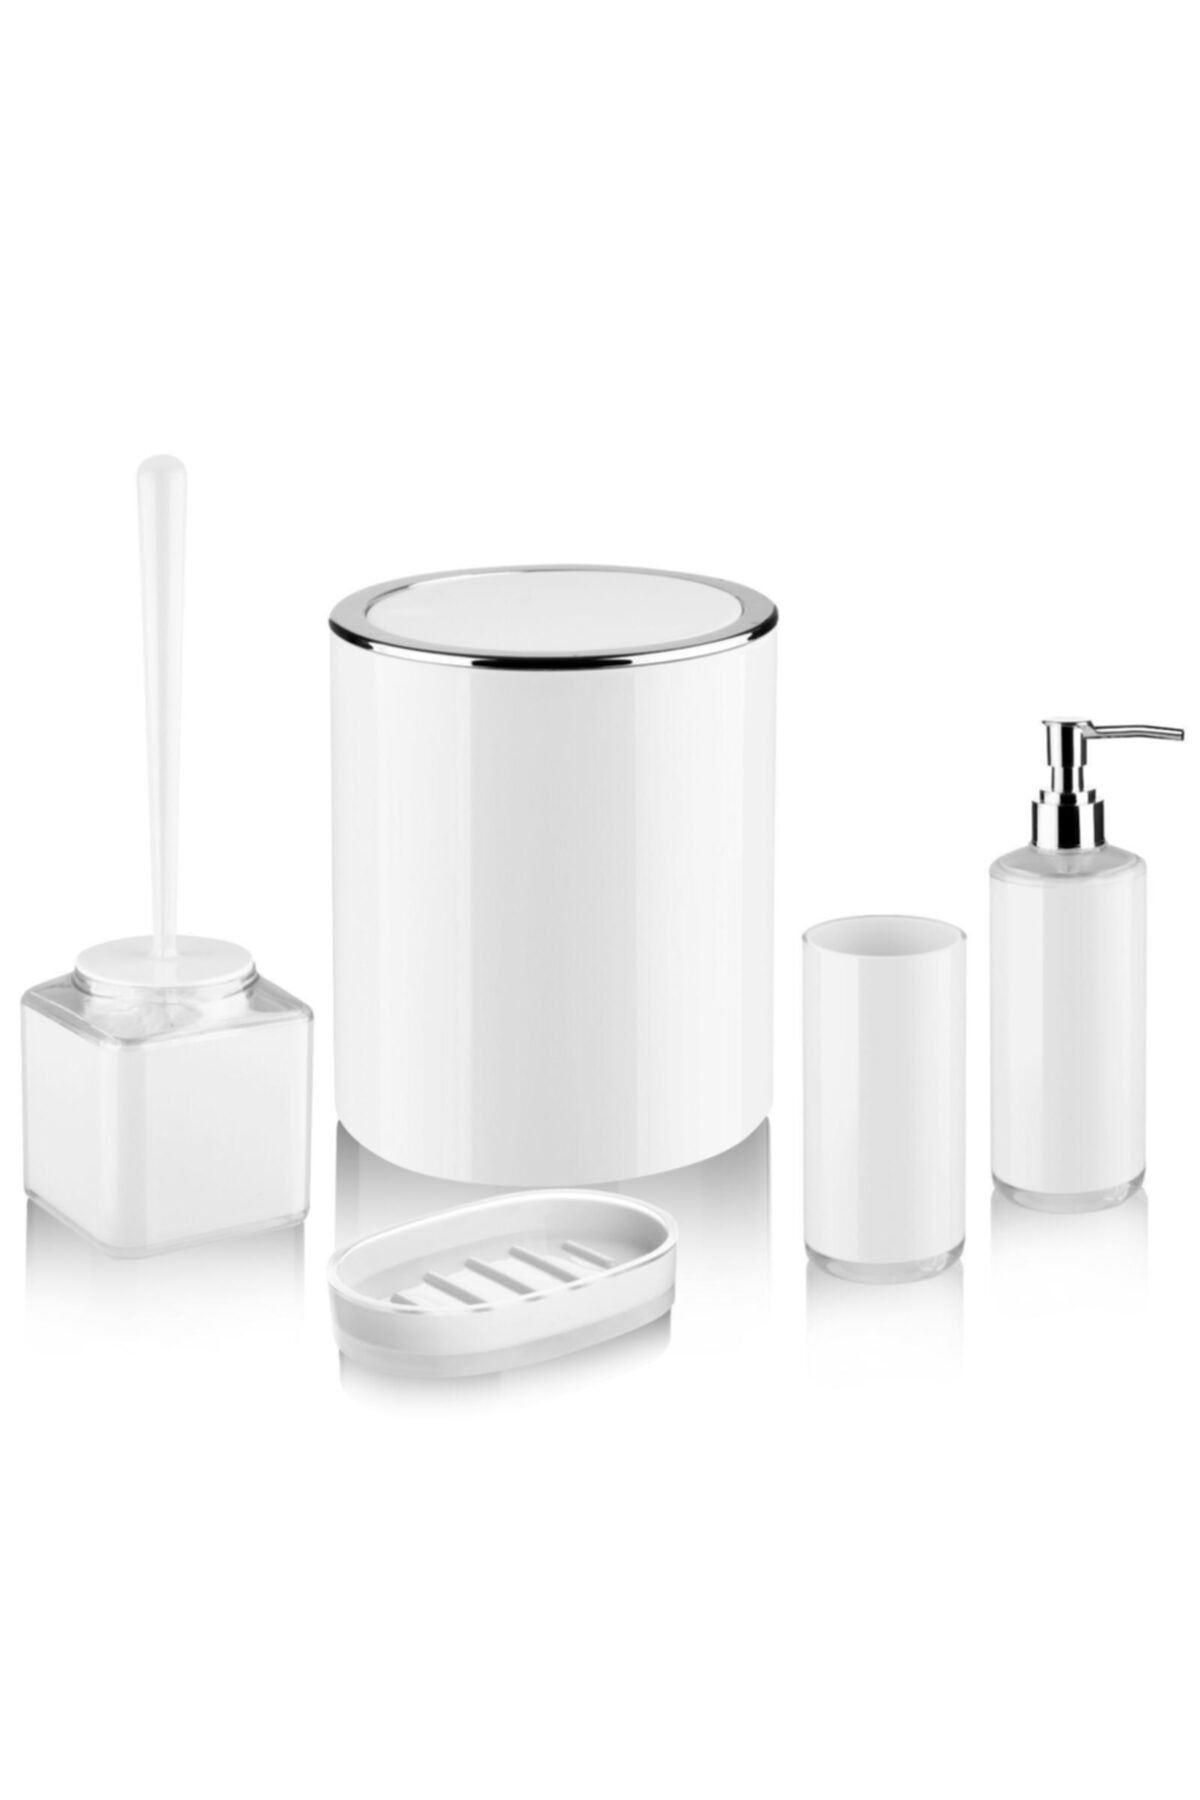 Kitchen Trend 5 Parça Akrilik  Beyaz Banyo Seti